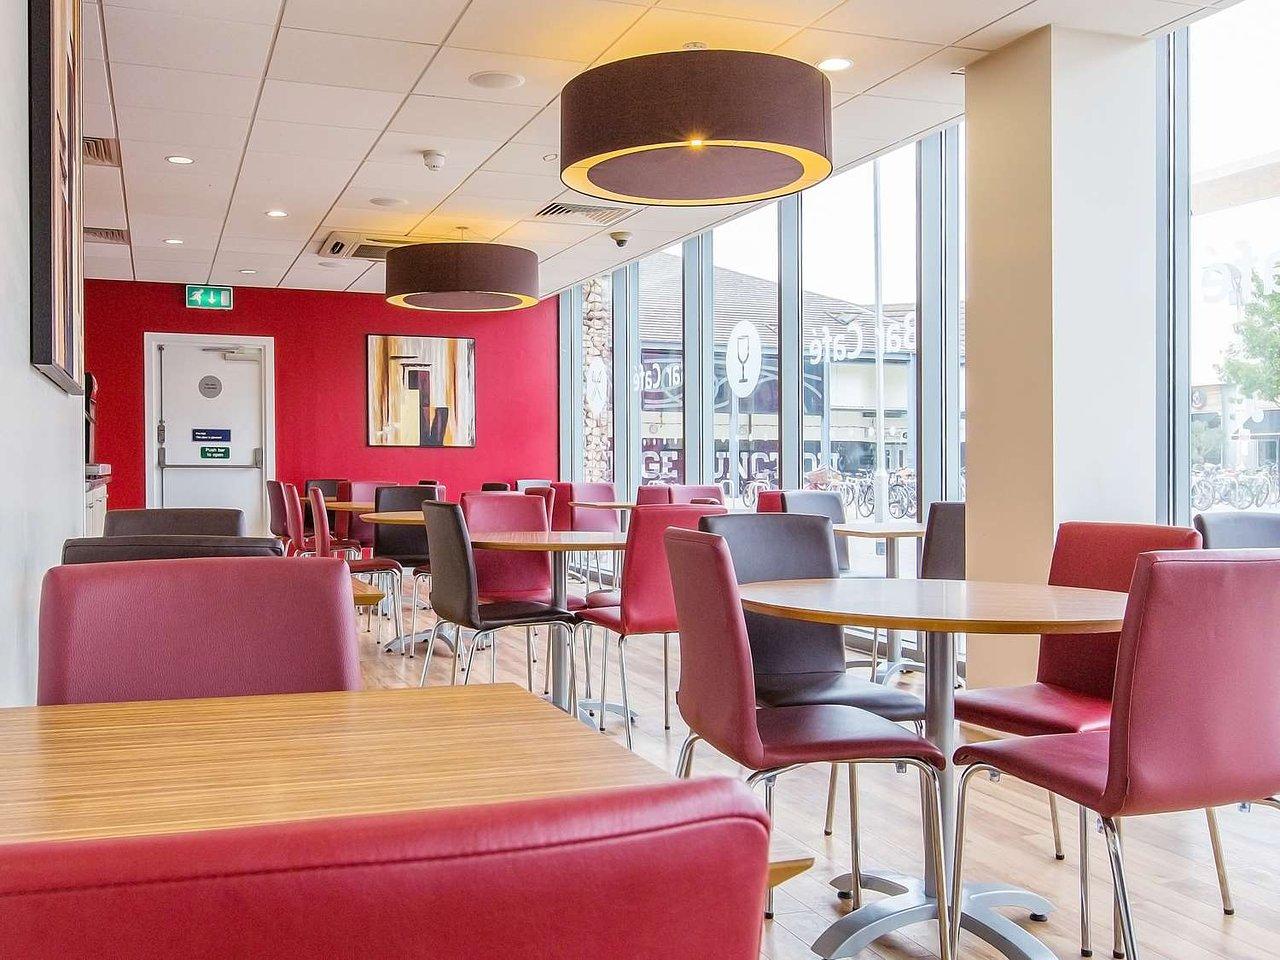 travelodge cambridge central hotel updated 2019 prices reviews rh tripadvisor com